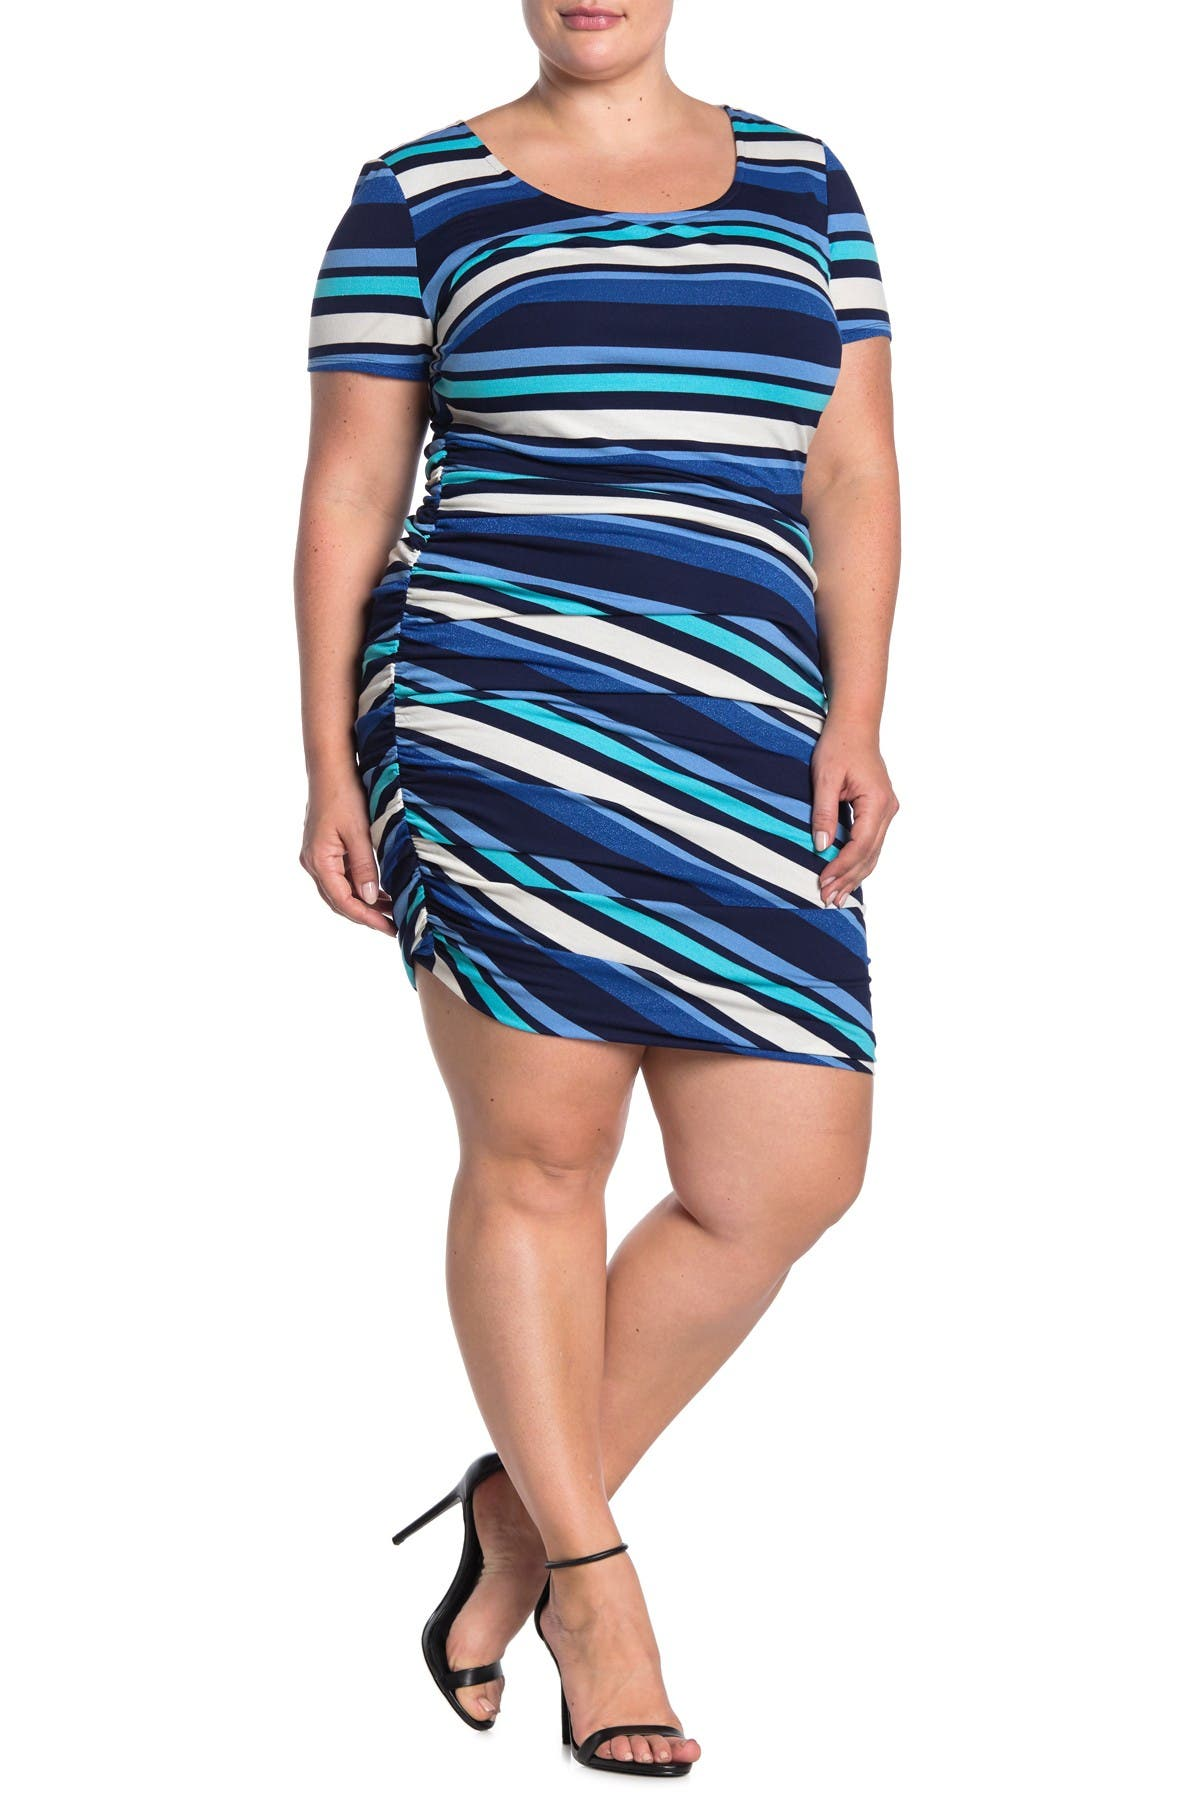 Image of Maree Pour Toi Stripe Side Ruche Dress